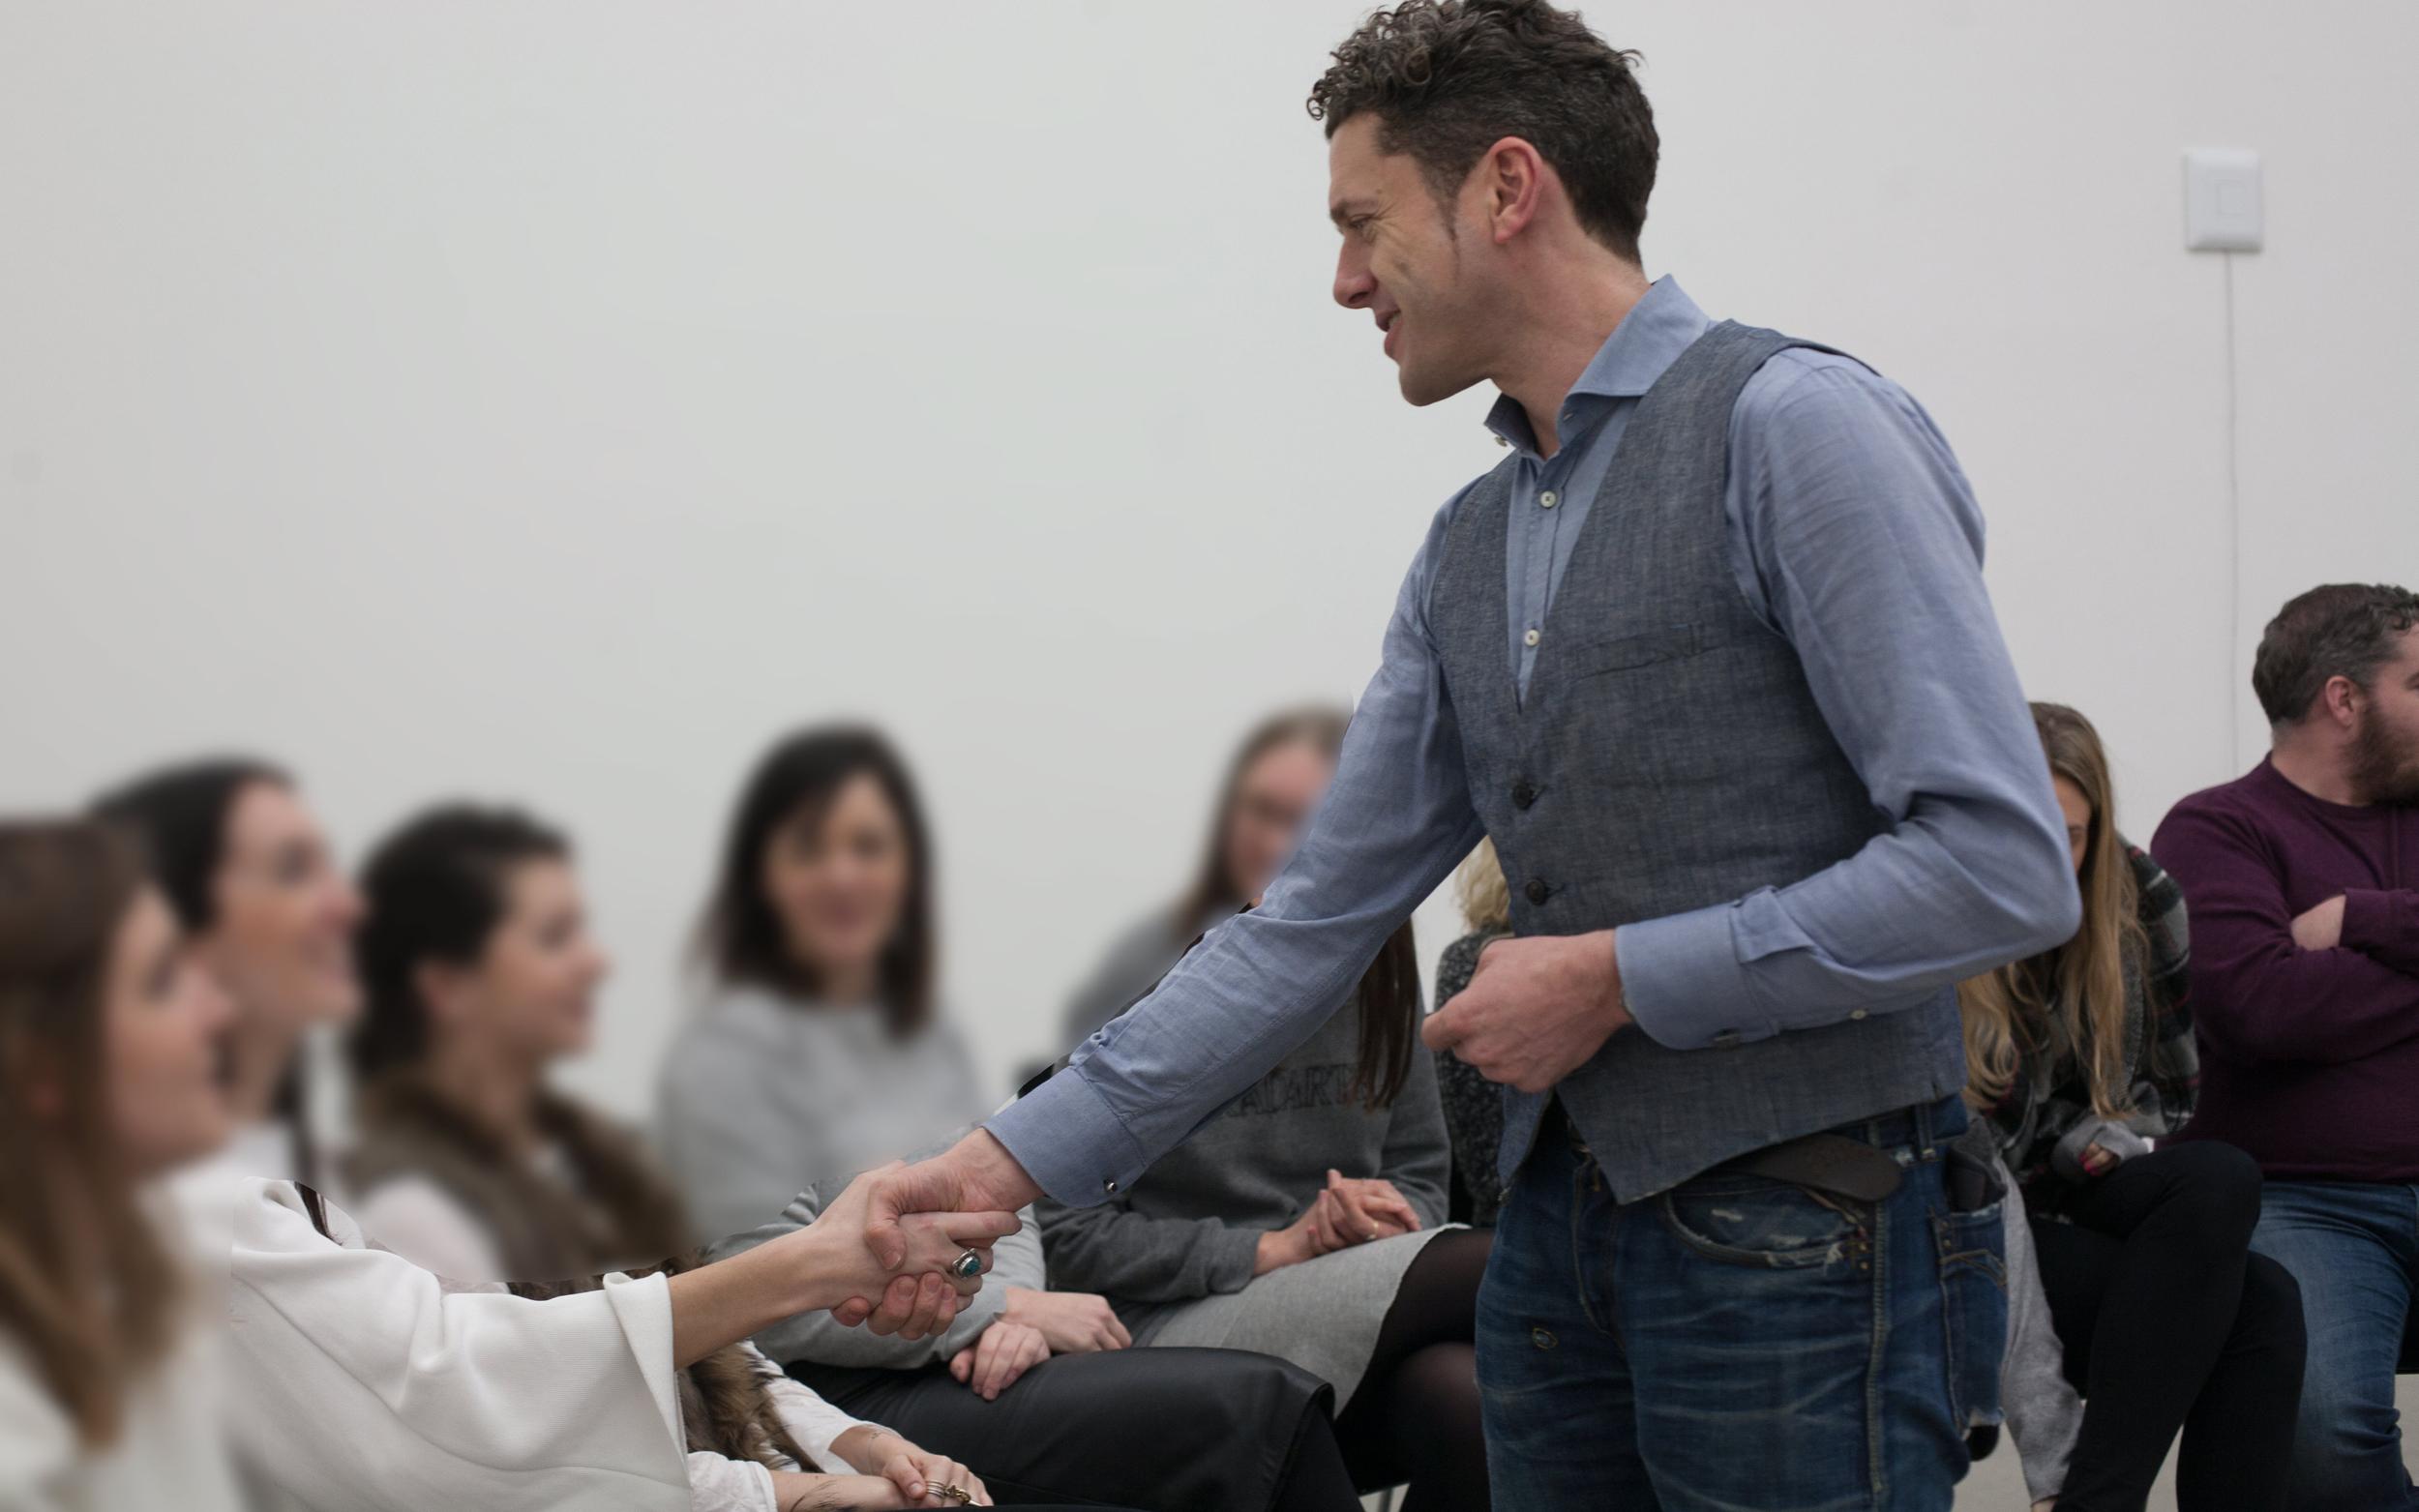 AJ Bicât teaches mindfulness and emotional intelligence at lyst